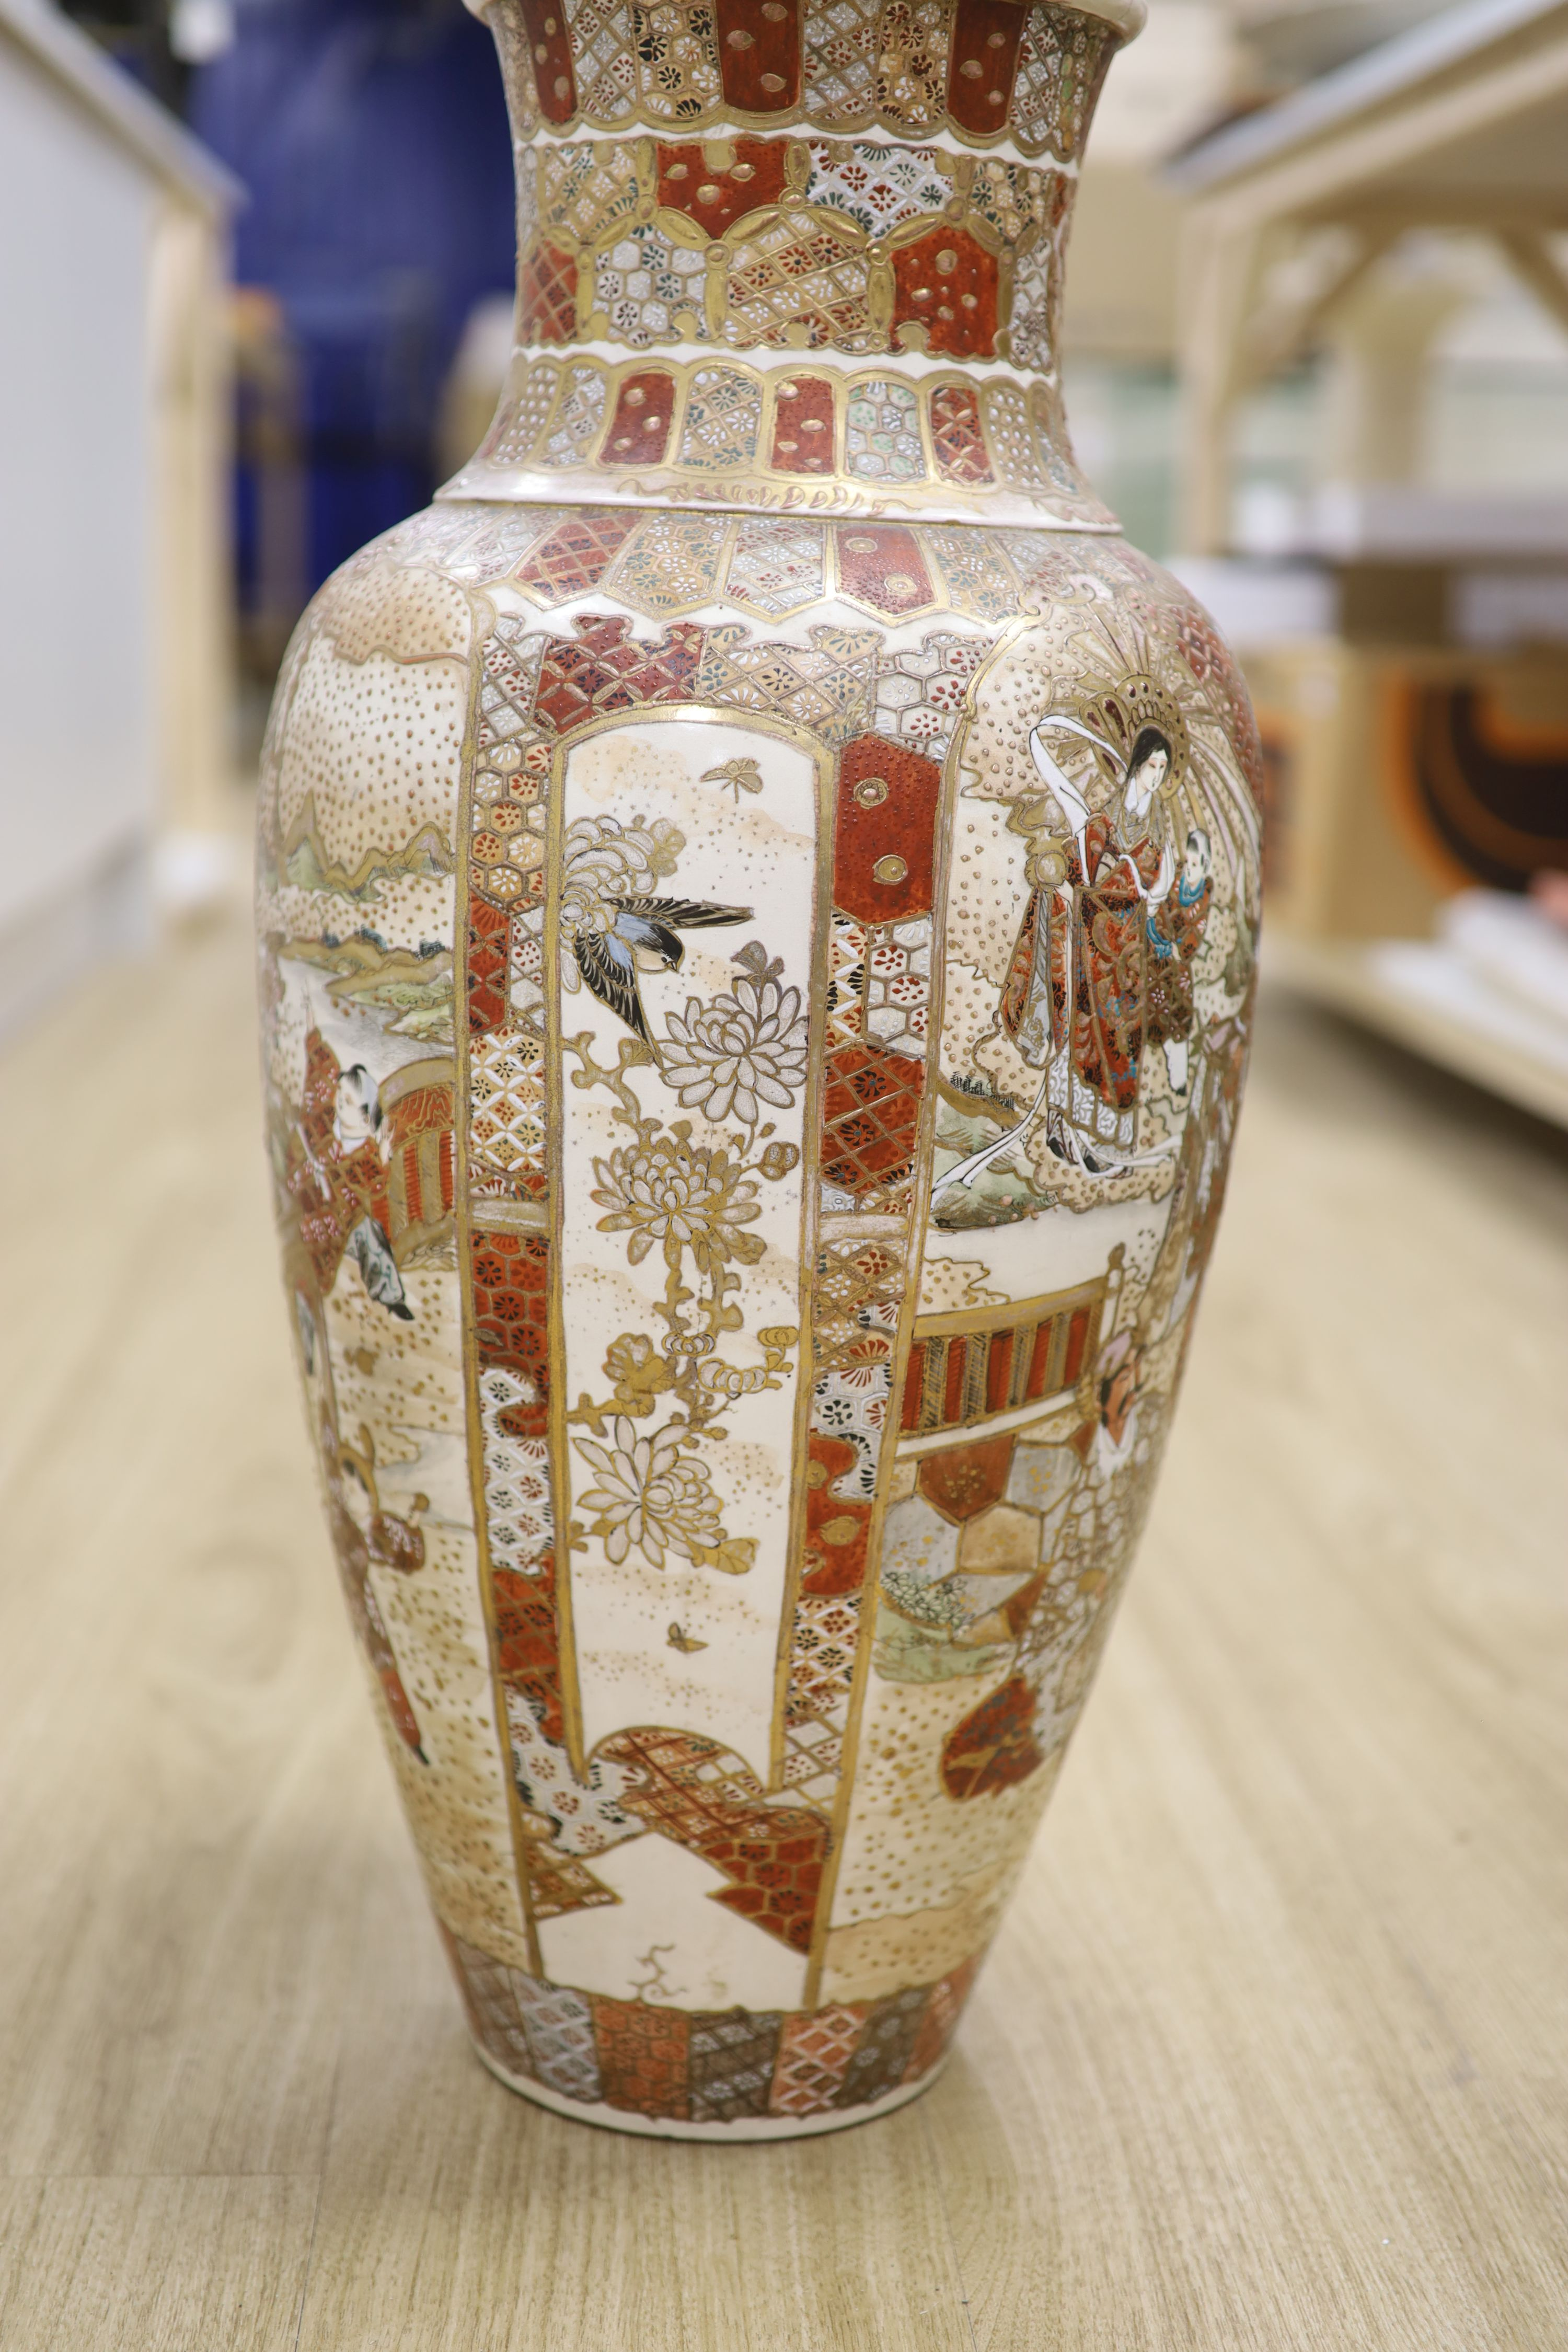 A large Satsuma pottery vase, height 63cm - Image 3 of 8